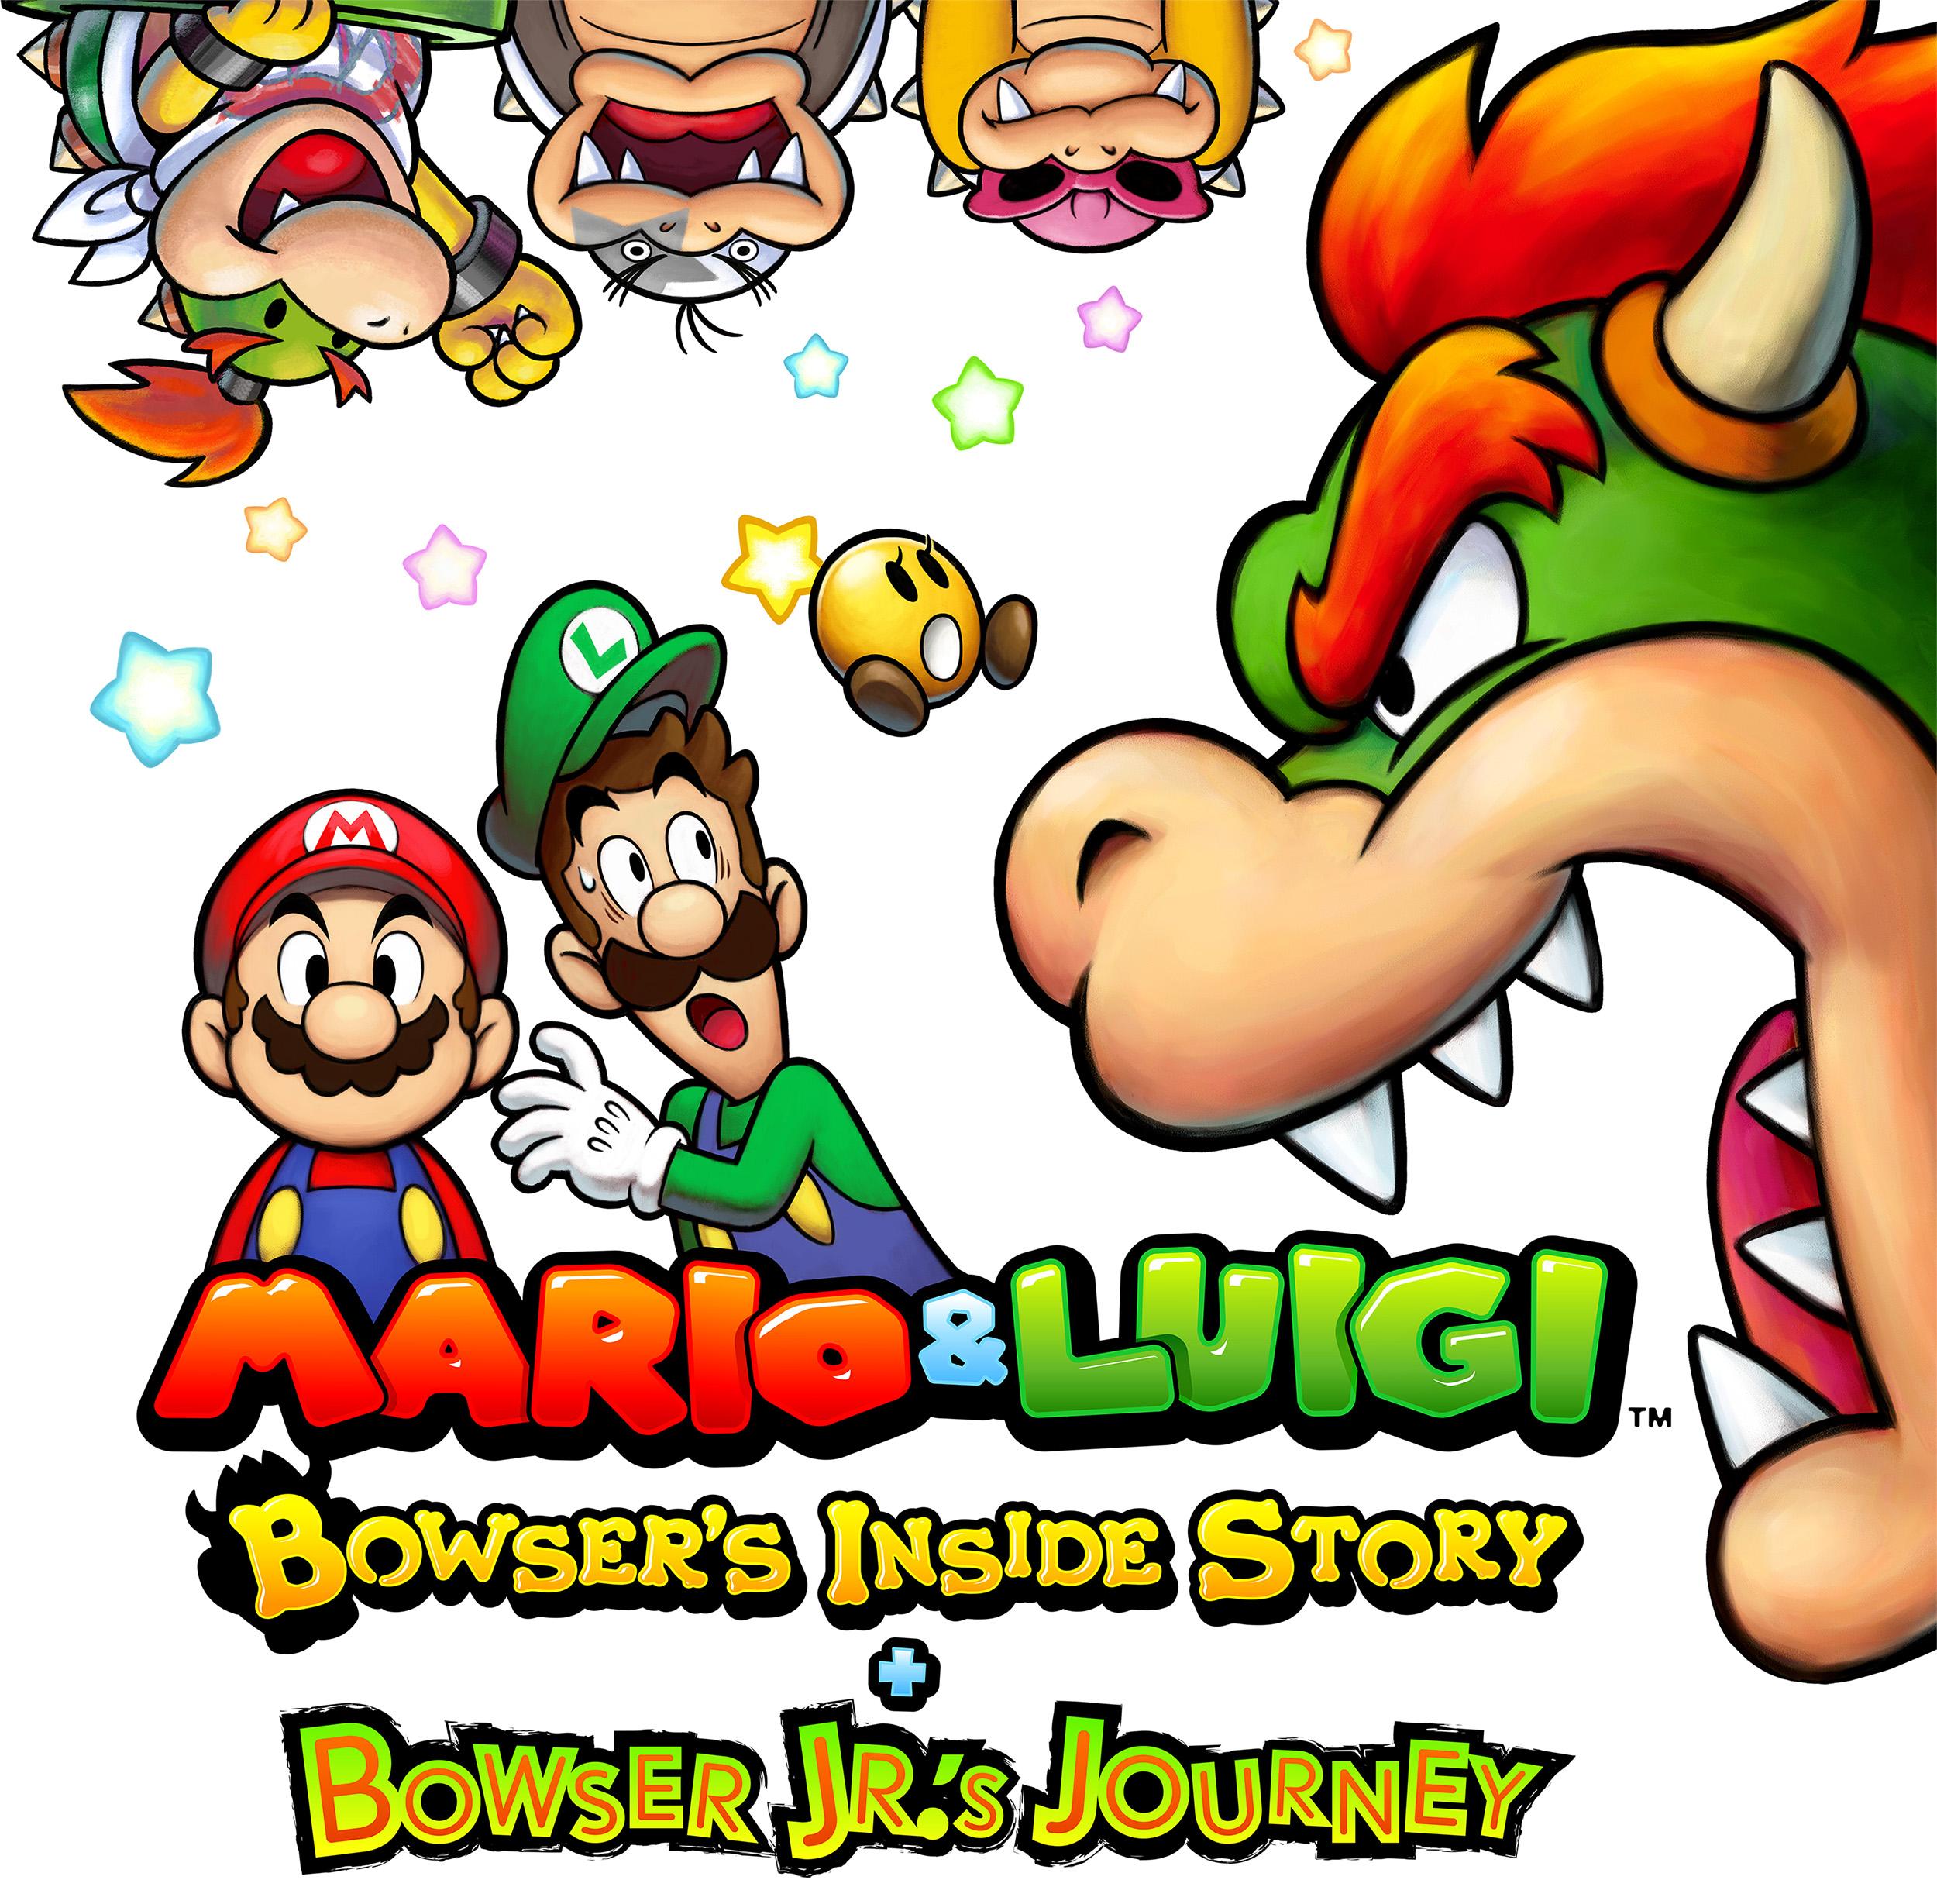 Mario & Luigi Bowser's Inside Story + Bowser Jr.'s Journey Key Visual